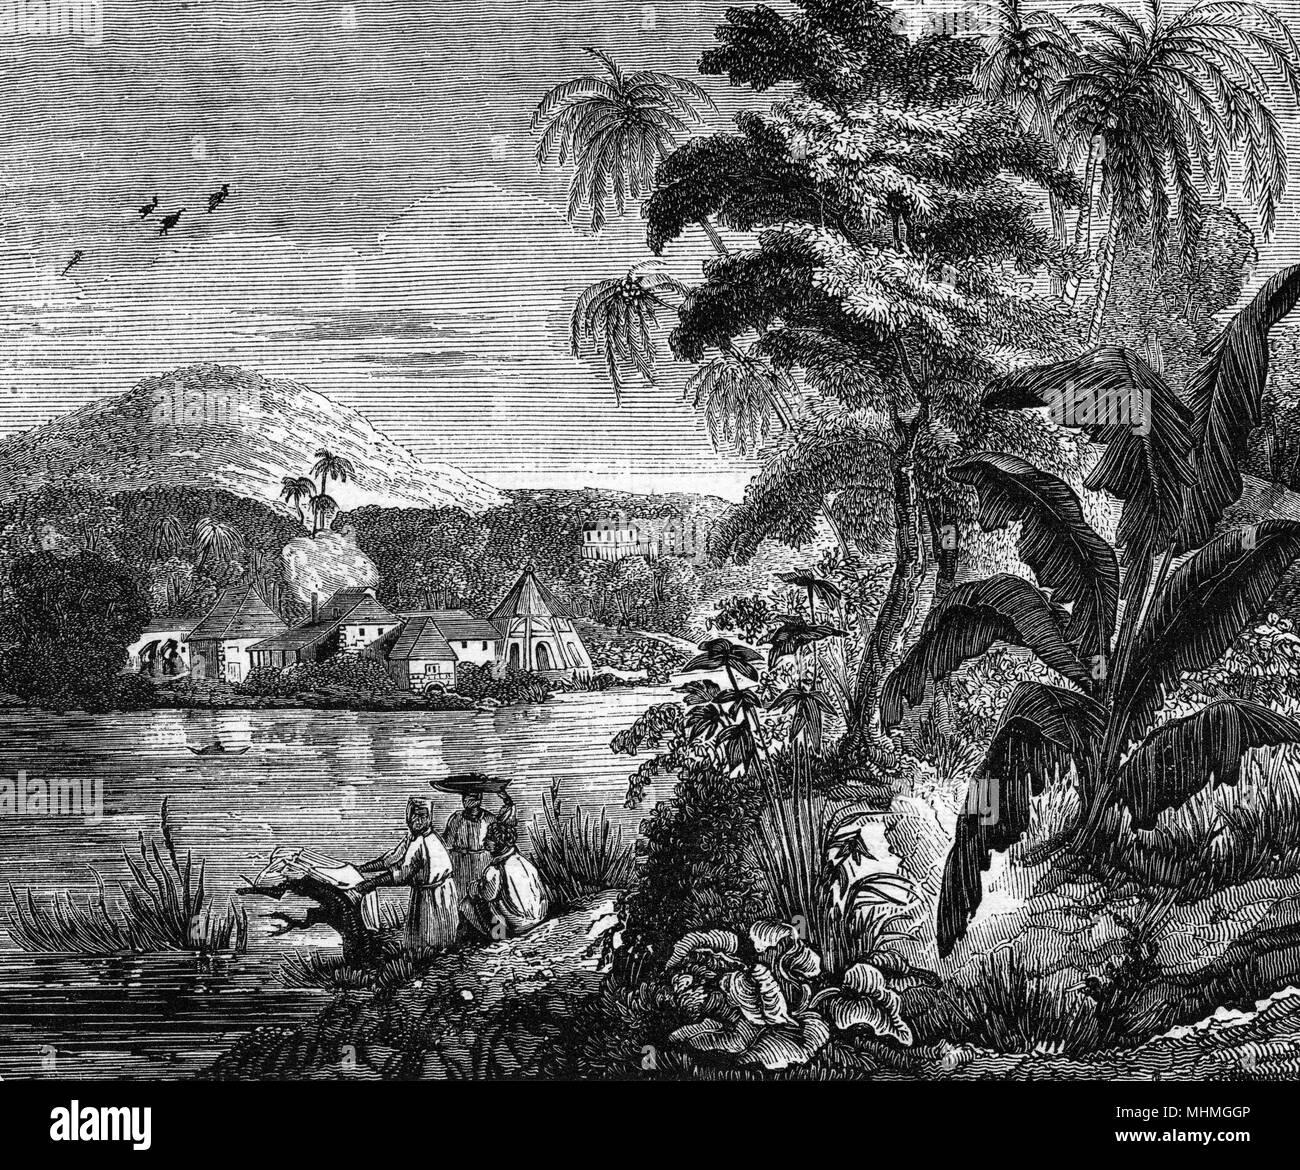 Un azúcar planation, Fecha: 1837 Foto de stock